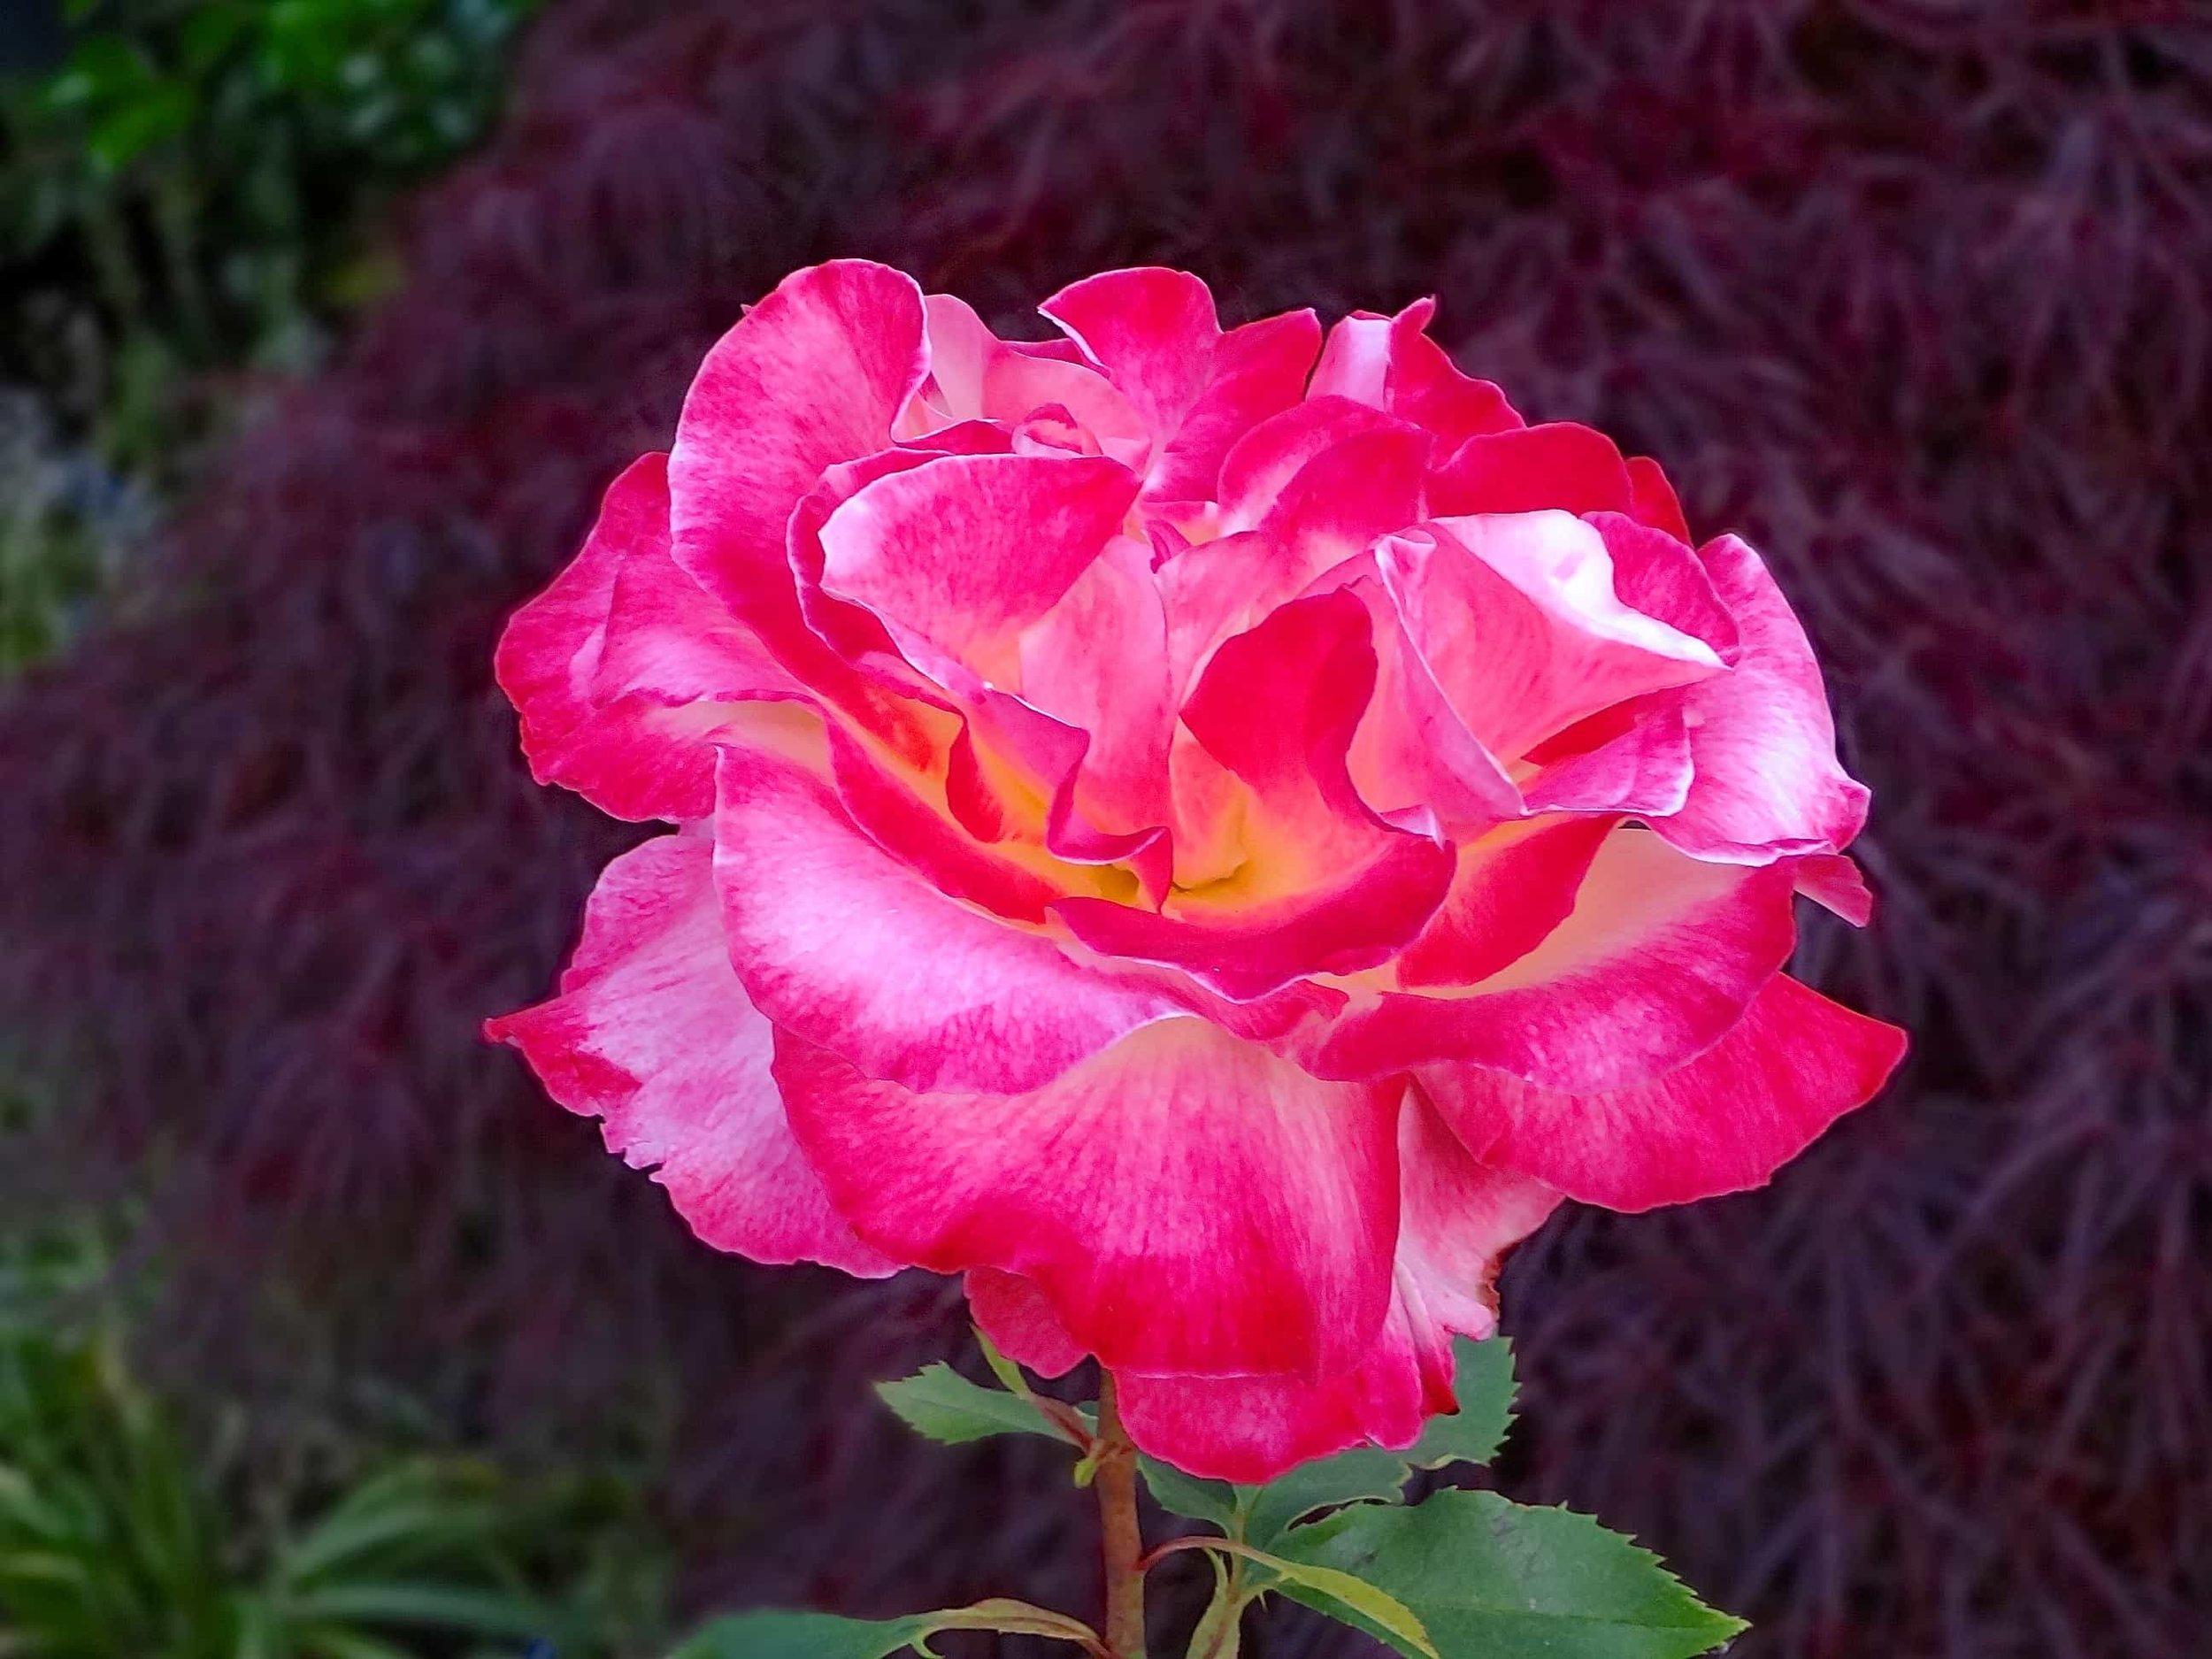 A Rose City rose